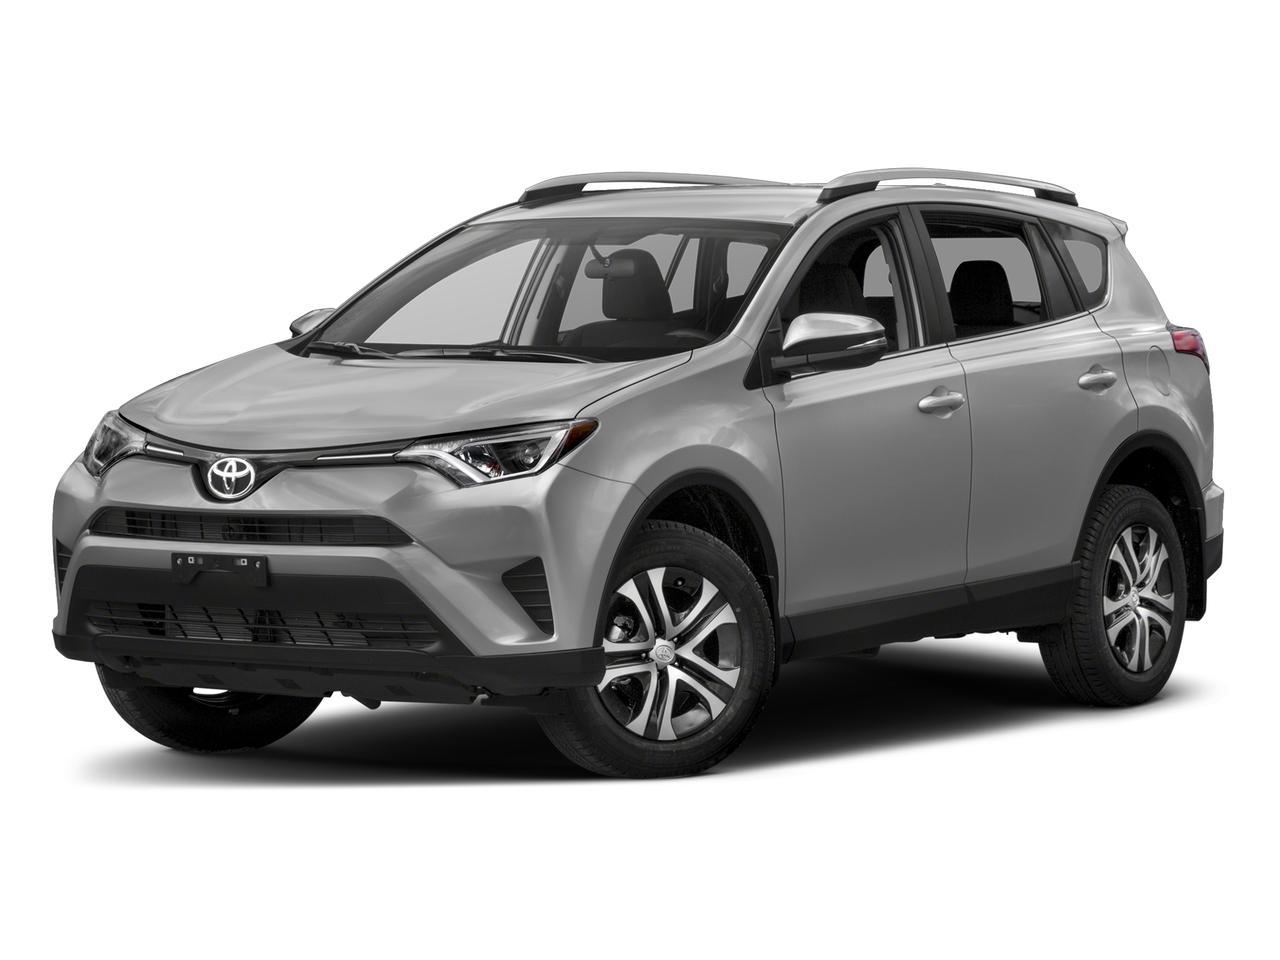 2018 Toyota RAV4 Vehicle Photo in Tucson, AZ 85705